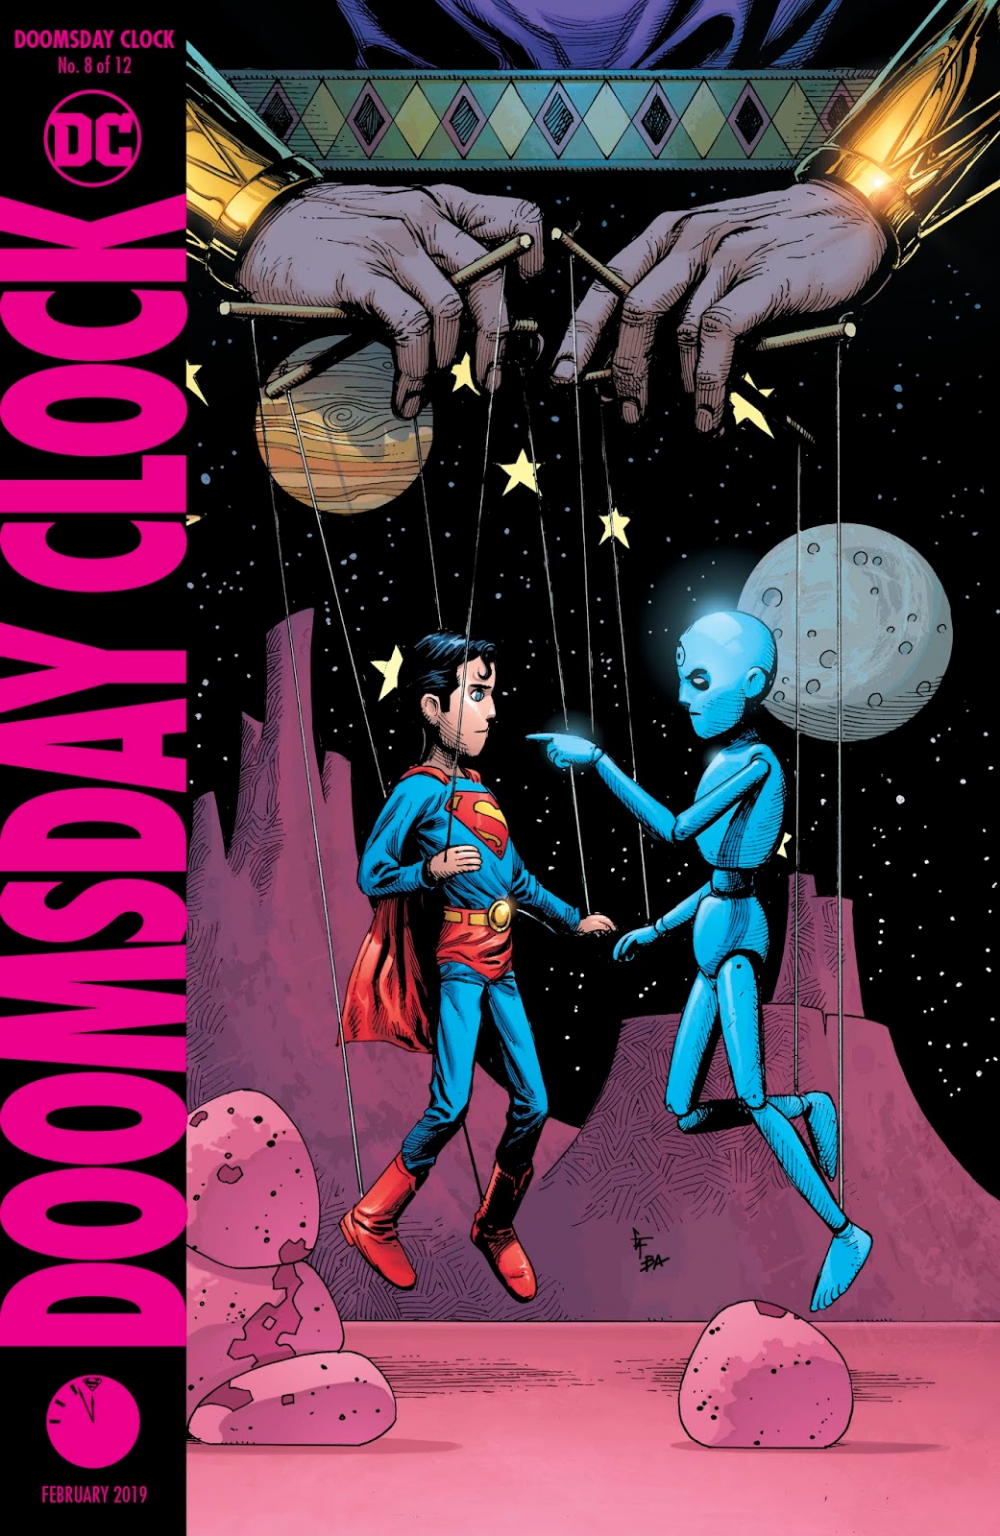 Doomsday Clock Issue 8 Read Doomsday Clock Issue 8 Comic